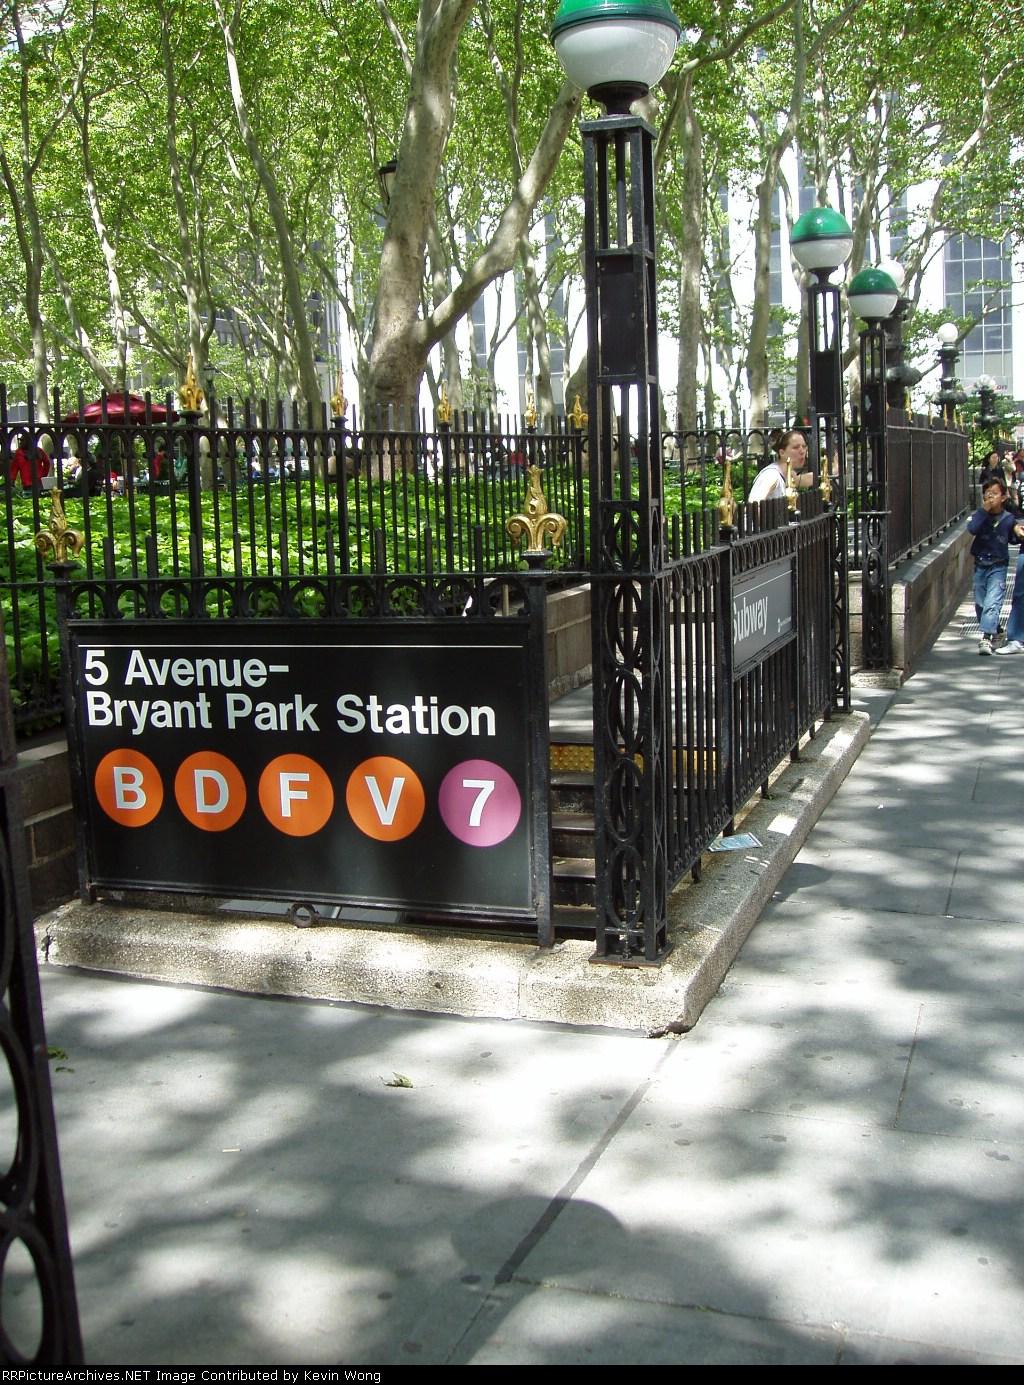 (506k, 1024x1385)<br><b>Country:</b> United States<br><b>City:</b> New York<br><b>System:</b> New York City Transit<br><b>Line:</b> IRT Flushing Line<br><b>Location:</b> 5th Avenue <br><b>Photo by:</b> Kevin Wong<br><b>Date:</b> 5/25/2006<br><b>Notes:</b> Station entrance.<br><b>Viewed (this week/total):</b> 3 / 4488